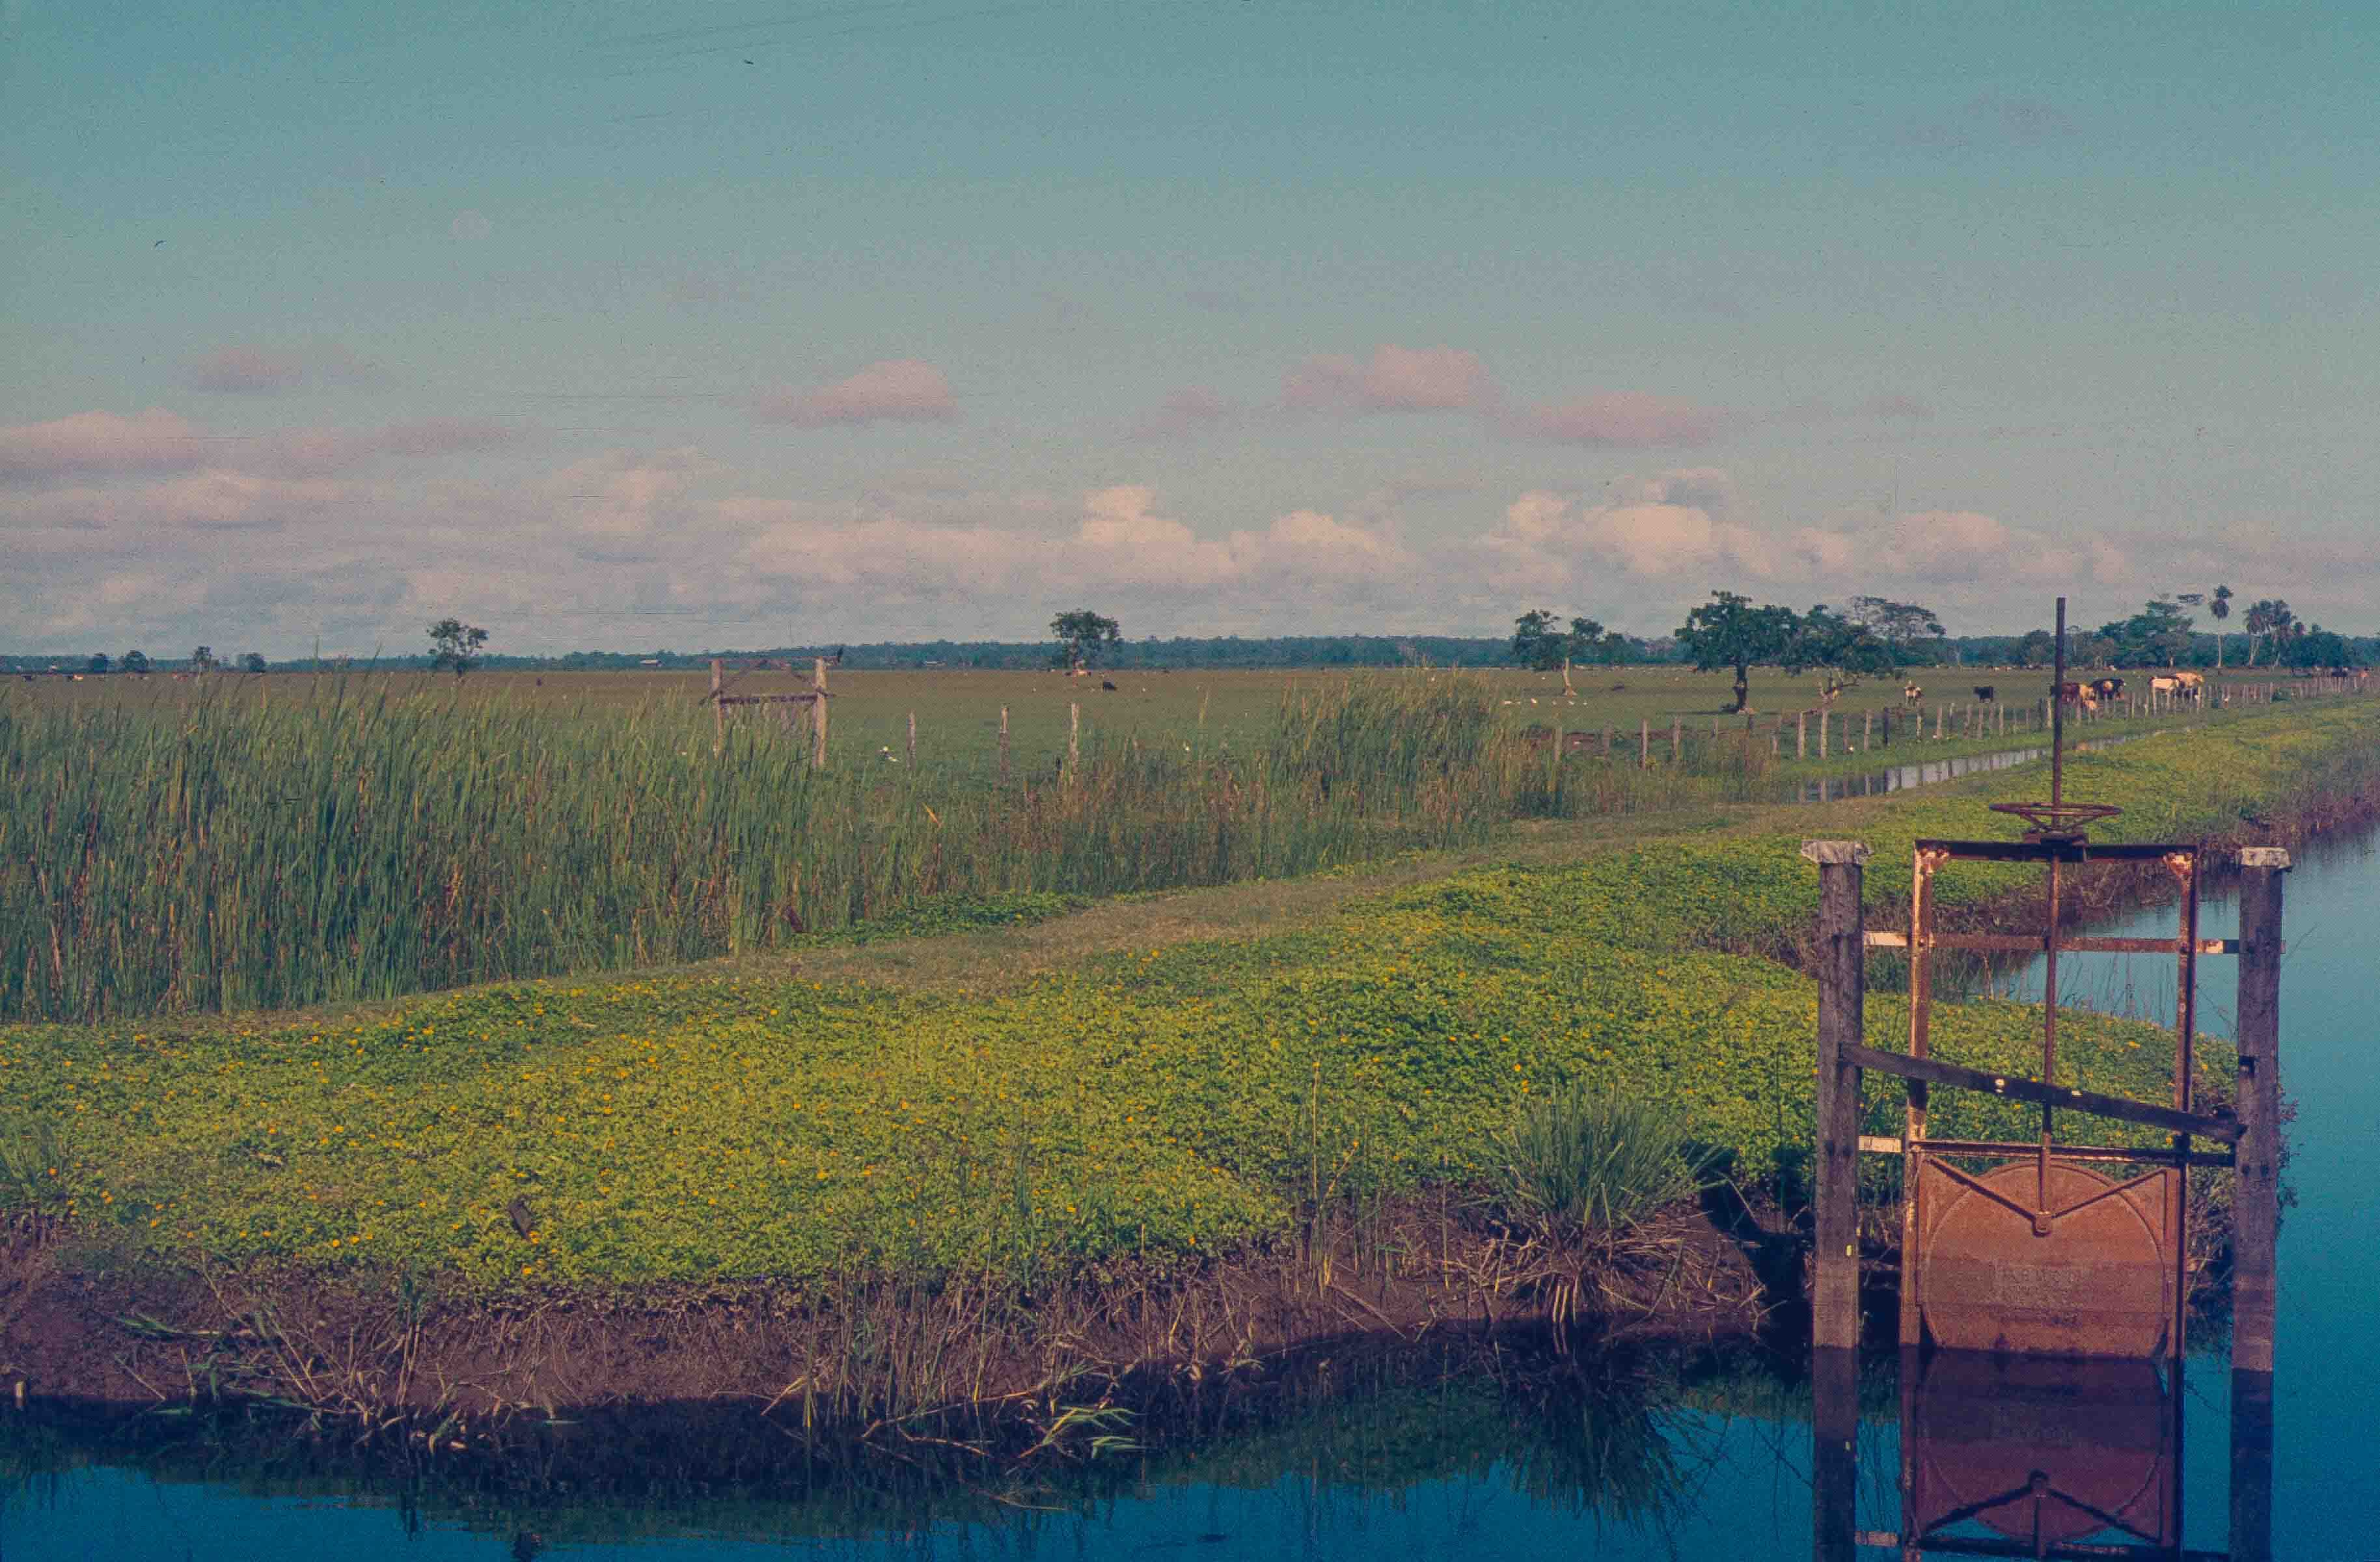 348. Suriname